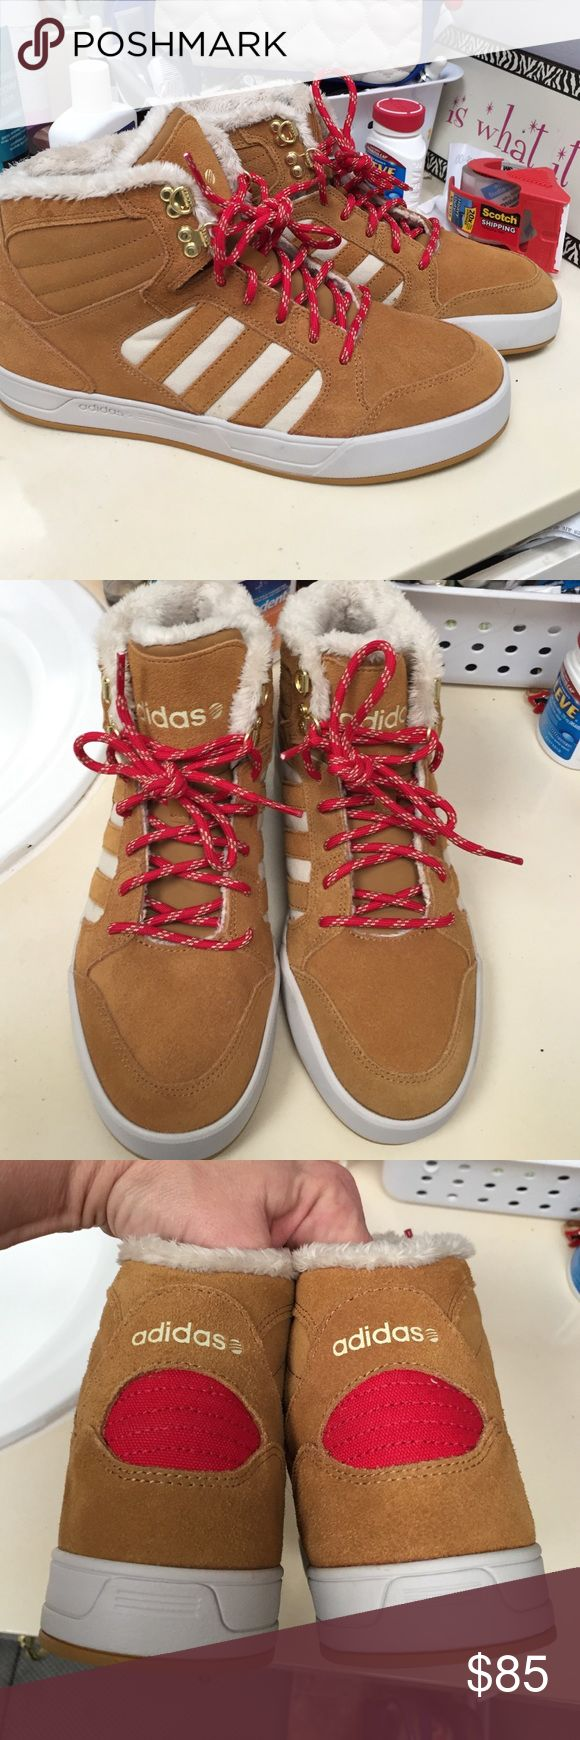 Adidas NEO Hightops Brand new. Adidas tan Ortholite NEO Hightops. Super cute. Size 9 Adidas Shoes